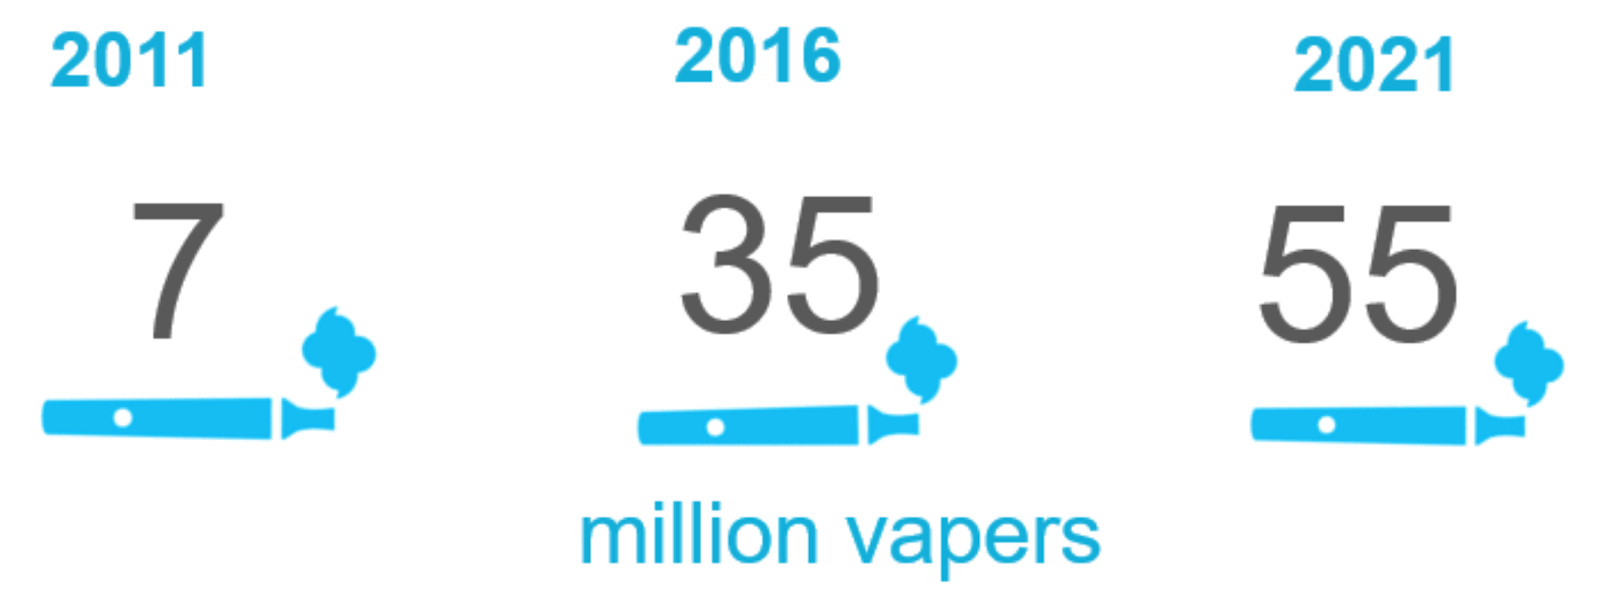 Is India right to ban e-cigarettes? | Apolitical